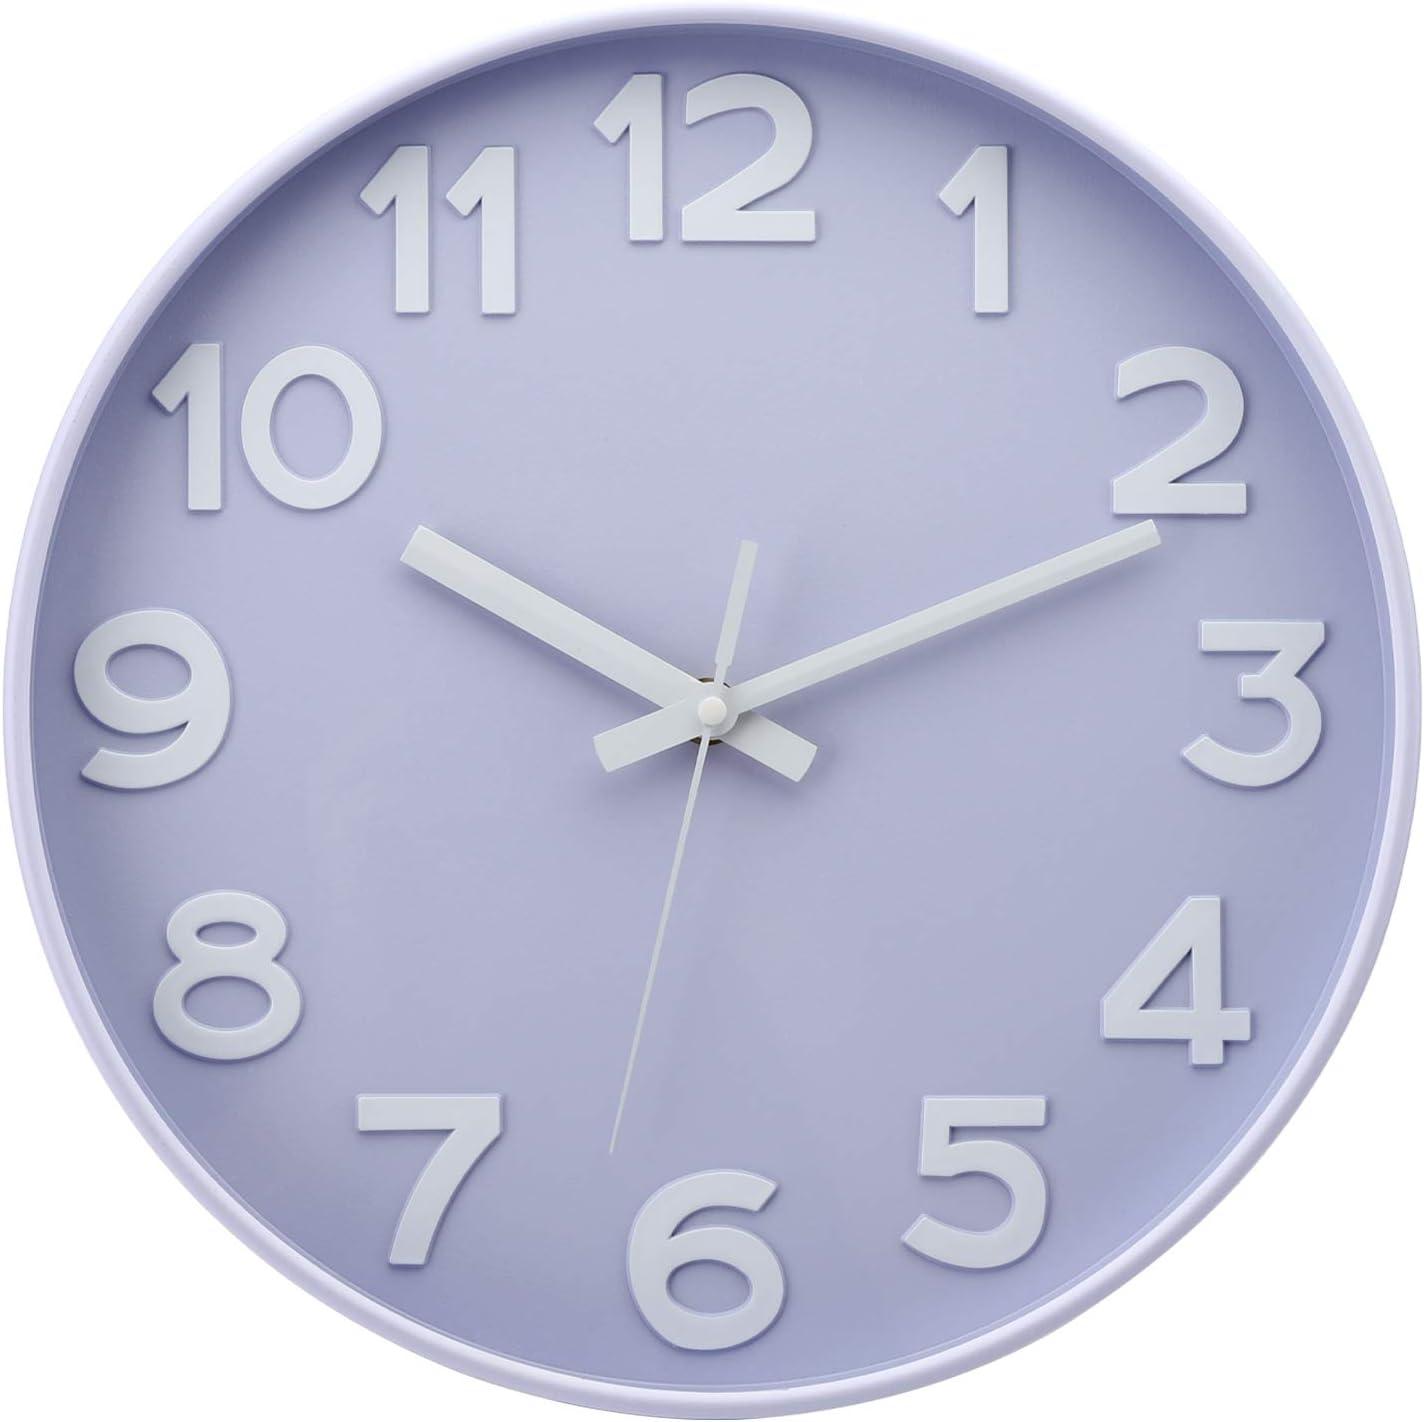 TOPZEA Silent Wall Clock 12 Inch, 3D Modern Non-Ticking Decorative Battery Operated Quartz Clock for Living Room, Bedroom, Kitchen, Office, Classroom, Nursery Room Creative Decoration, Light Purple